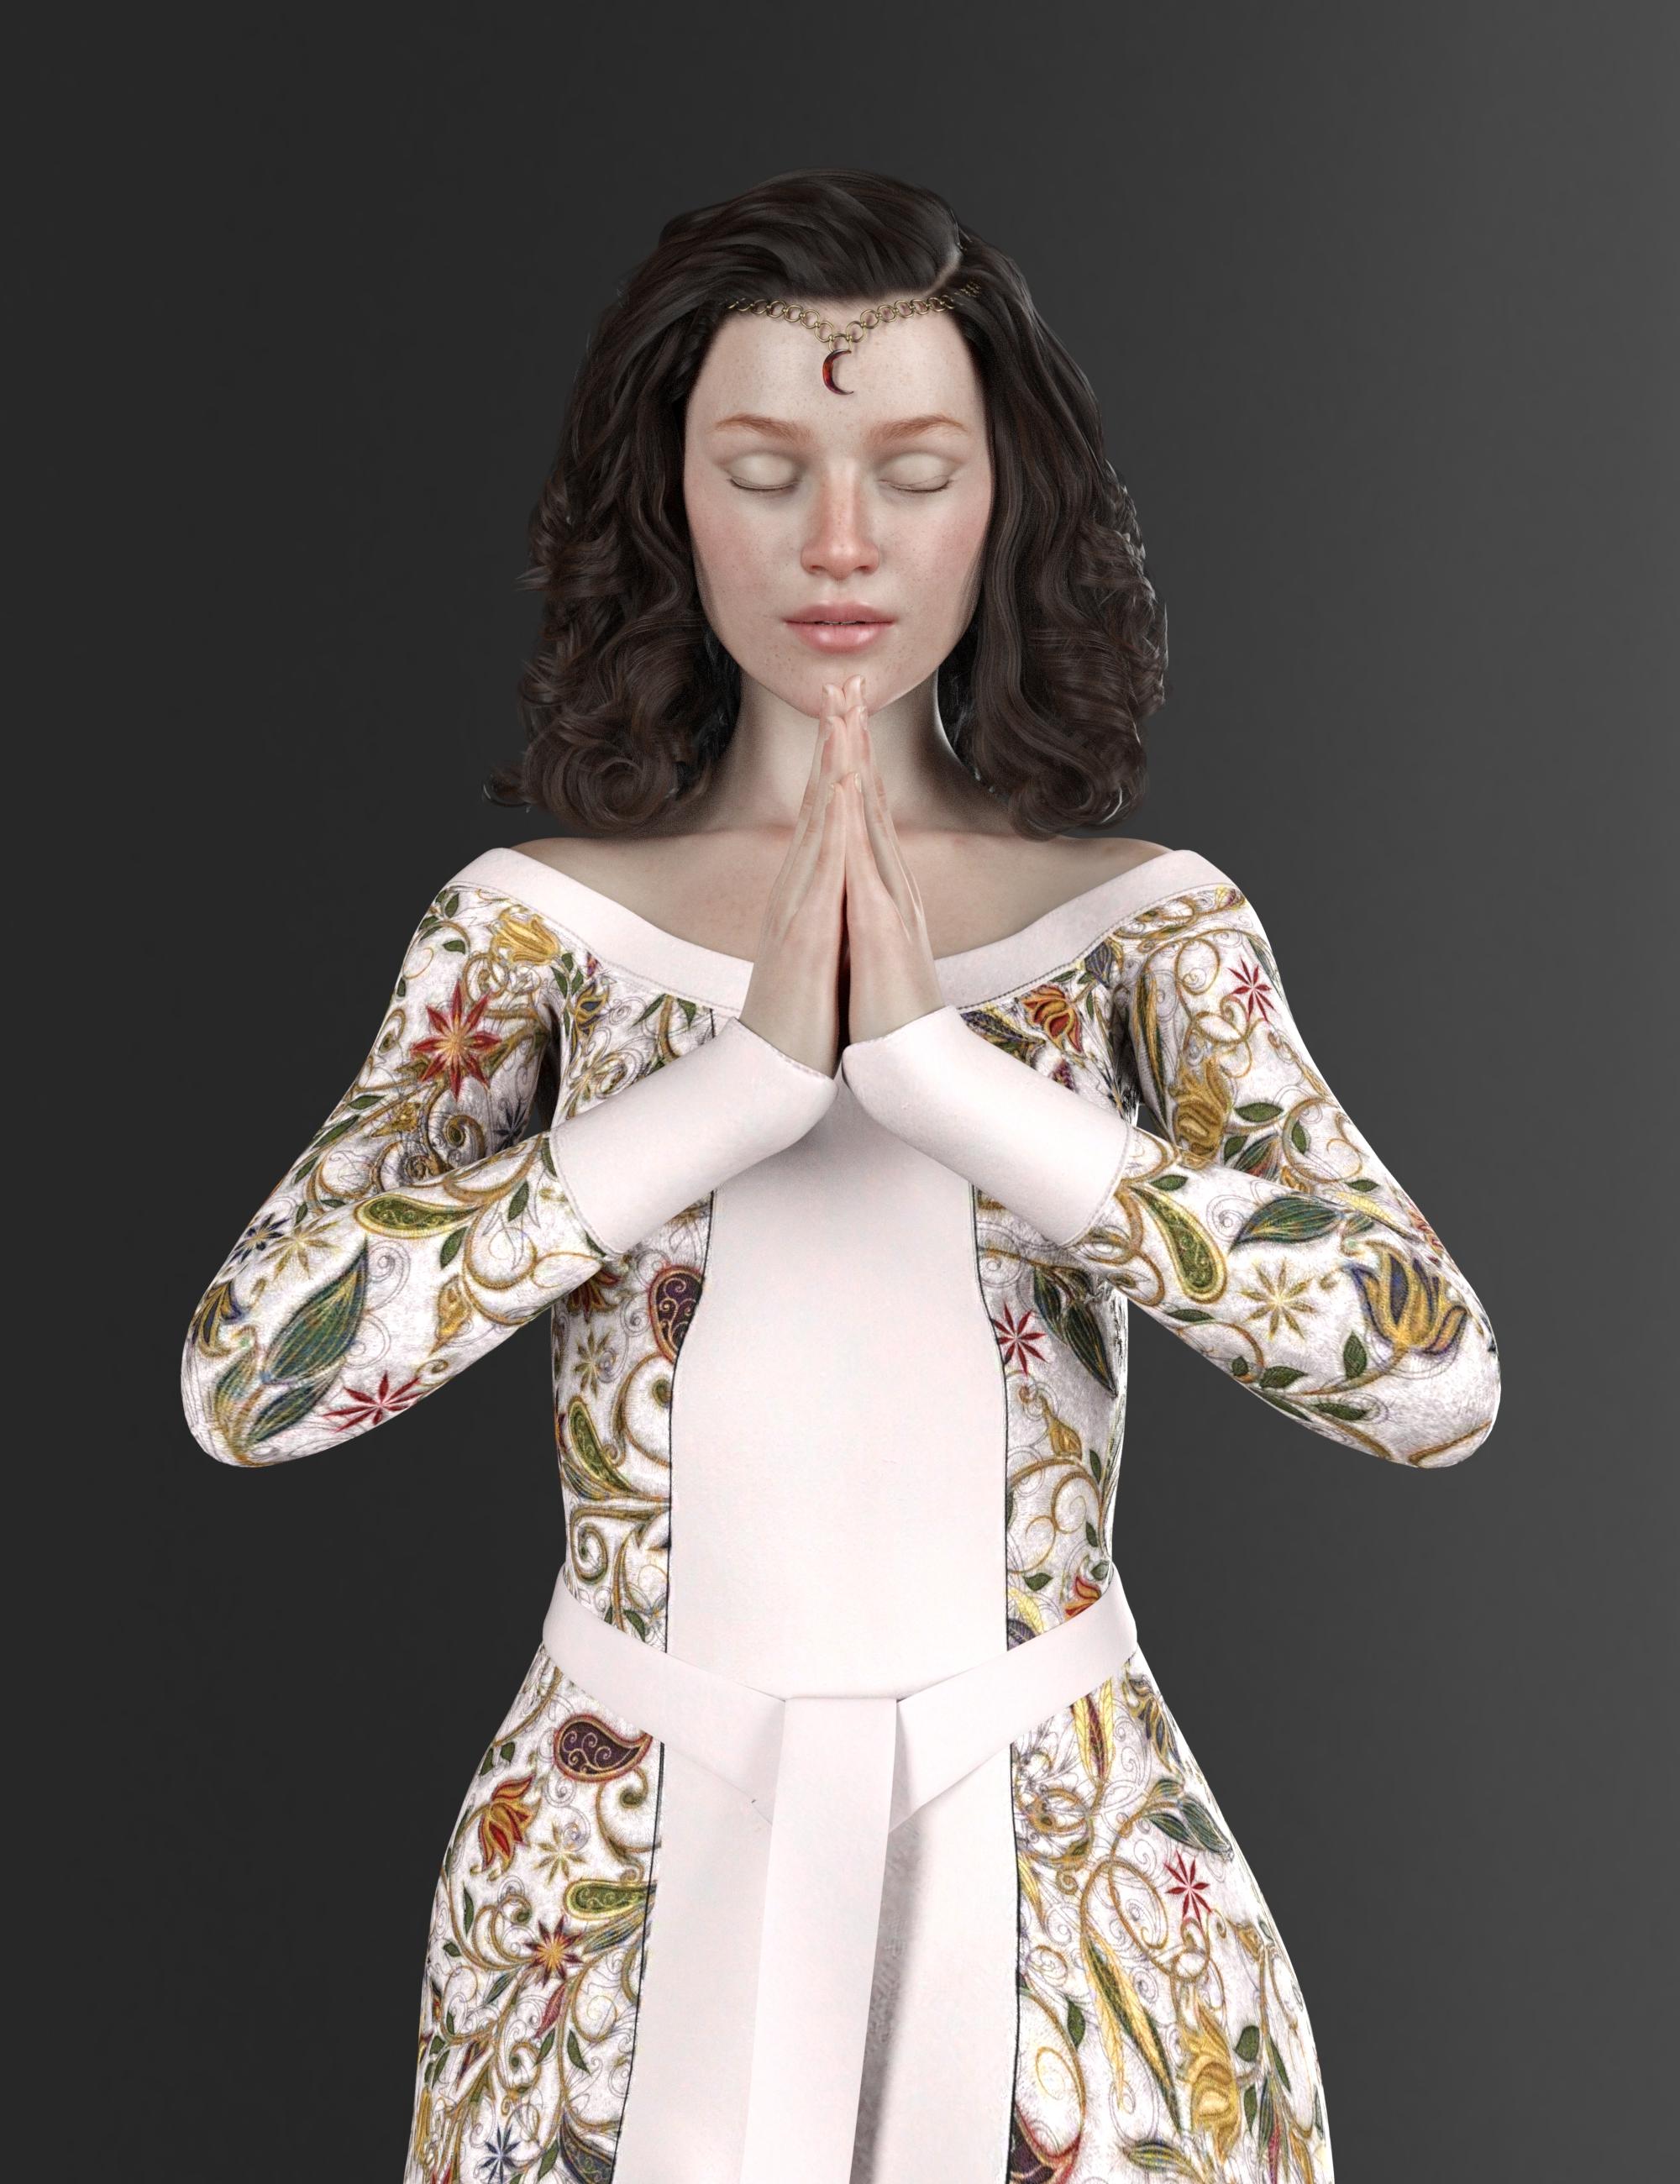 Nobility Textures for dForce Elven Dress by: Sade, 3D Models by Daz 3D